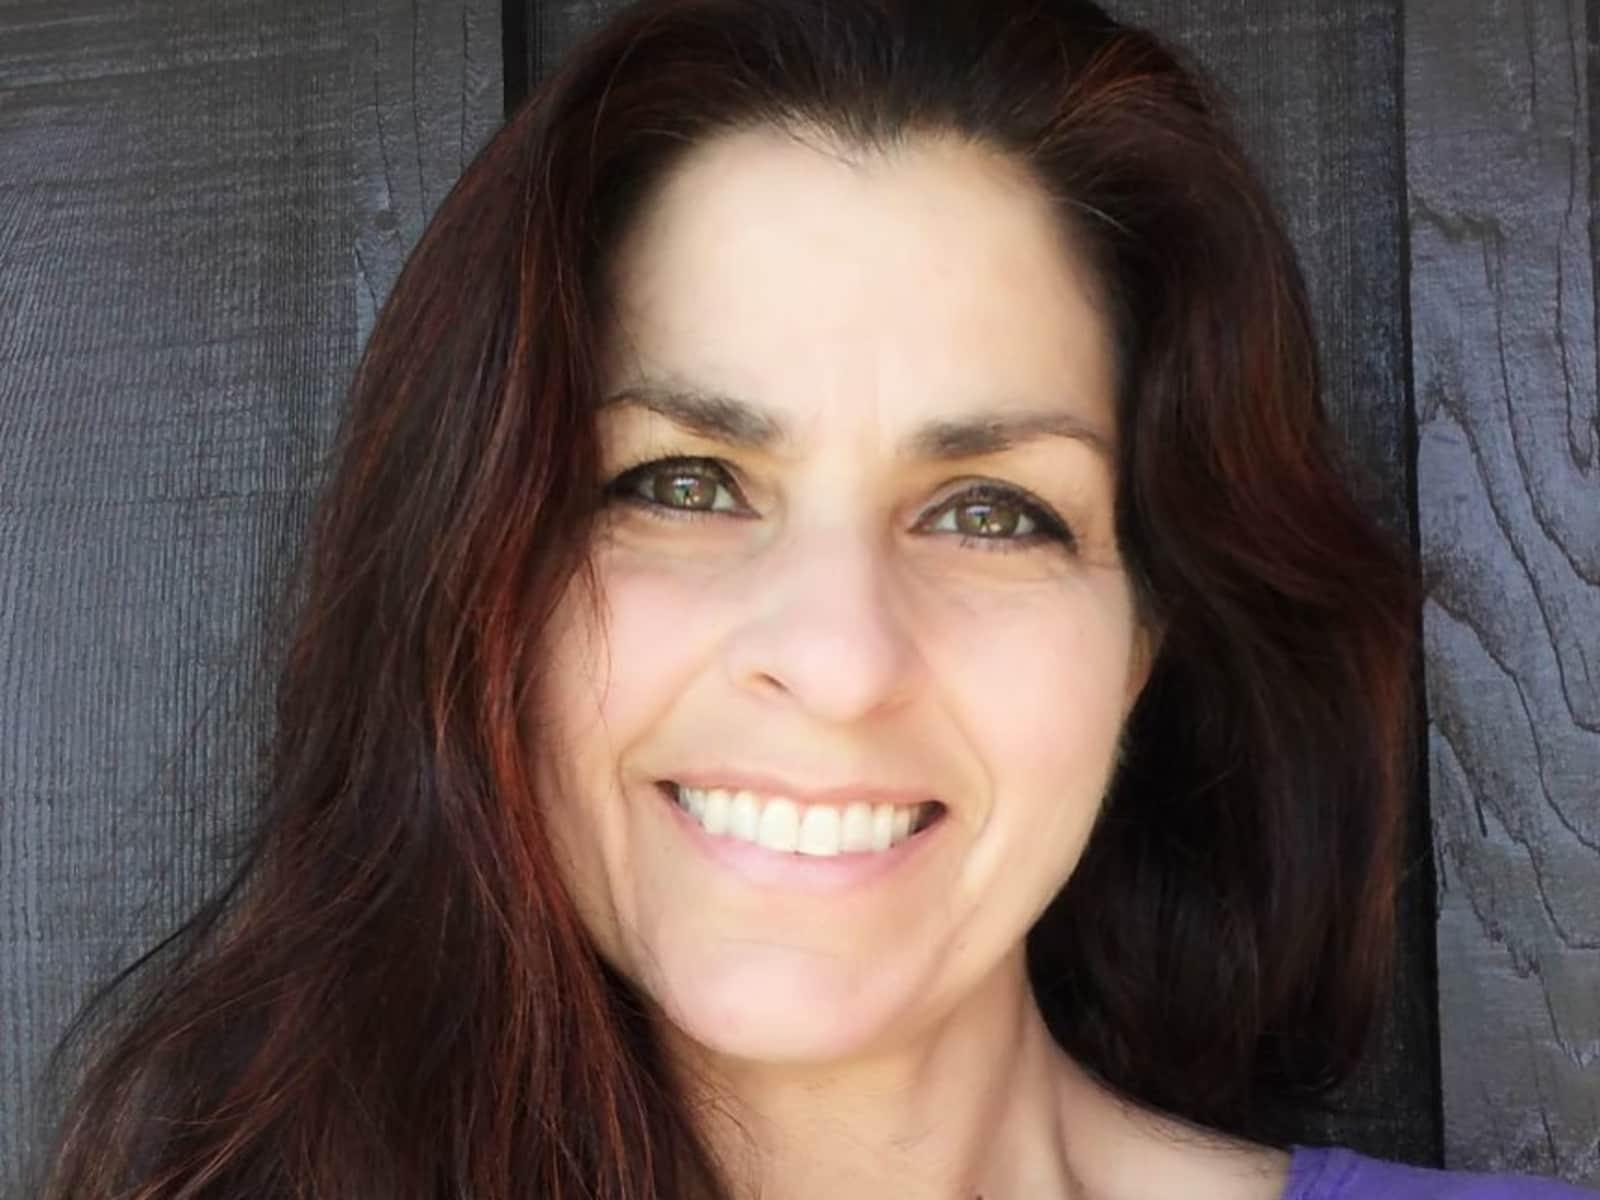 Diana from Huntington Beach, California, United States